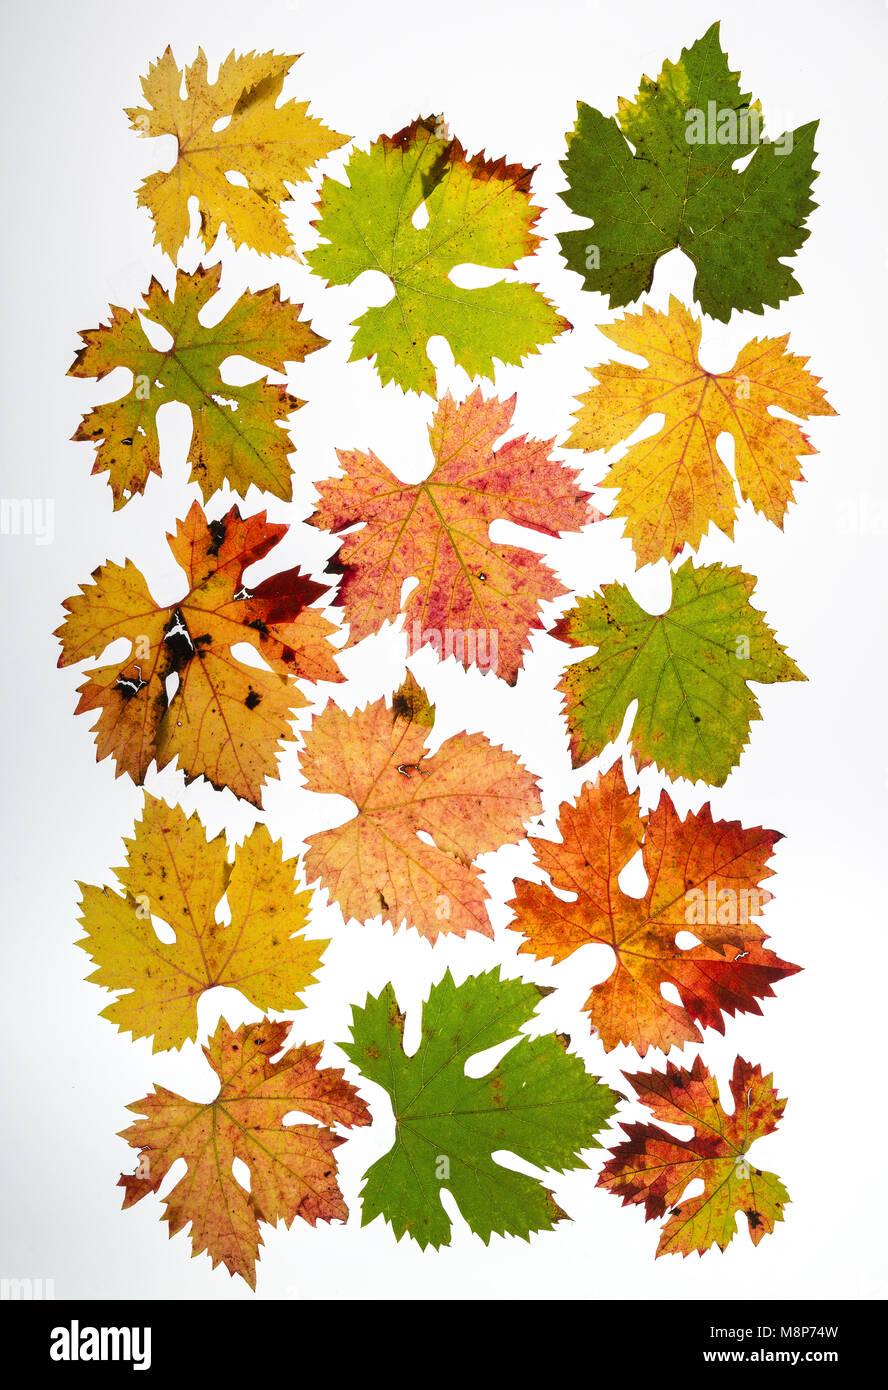 Datenblatt zu verschiedenen Weinblättern Stockbild